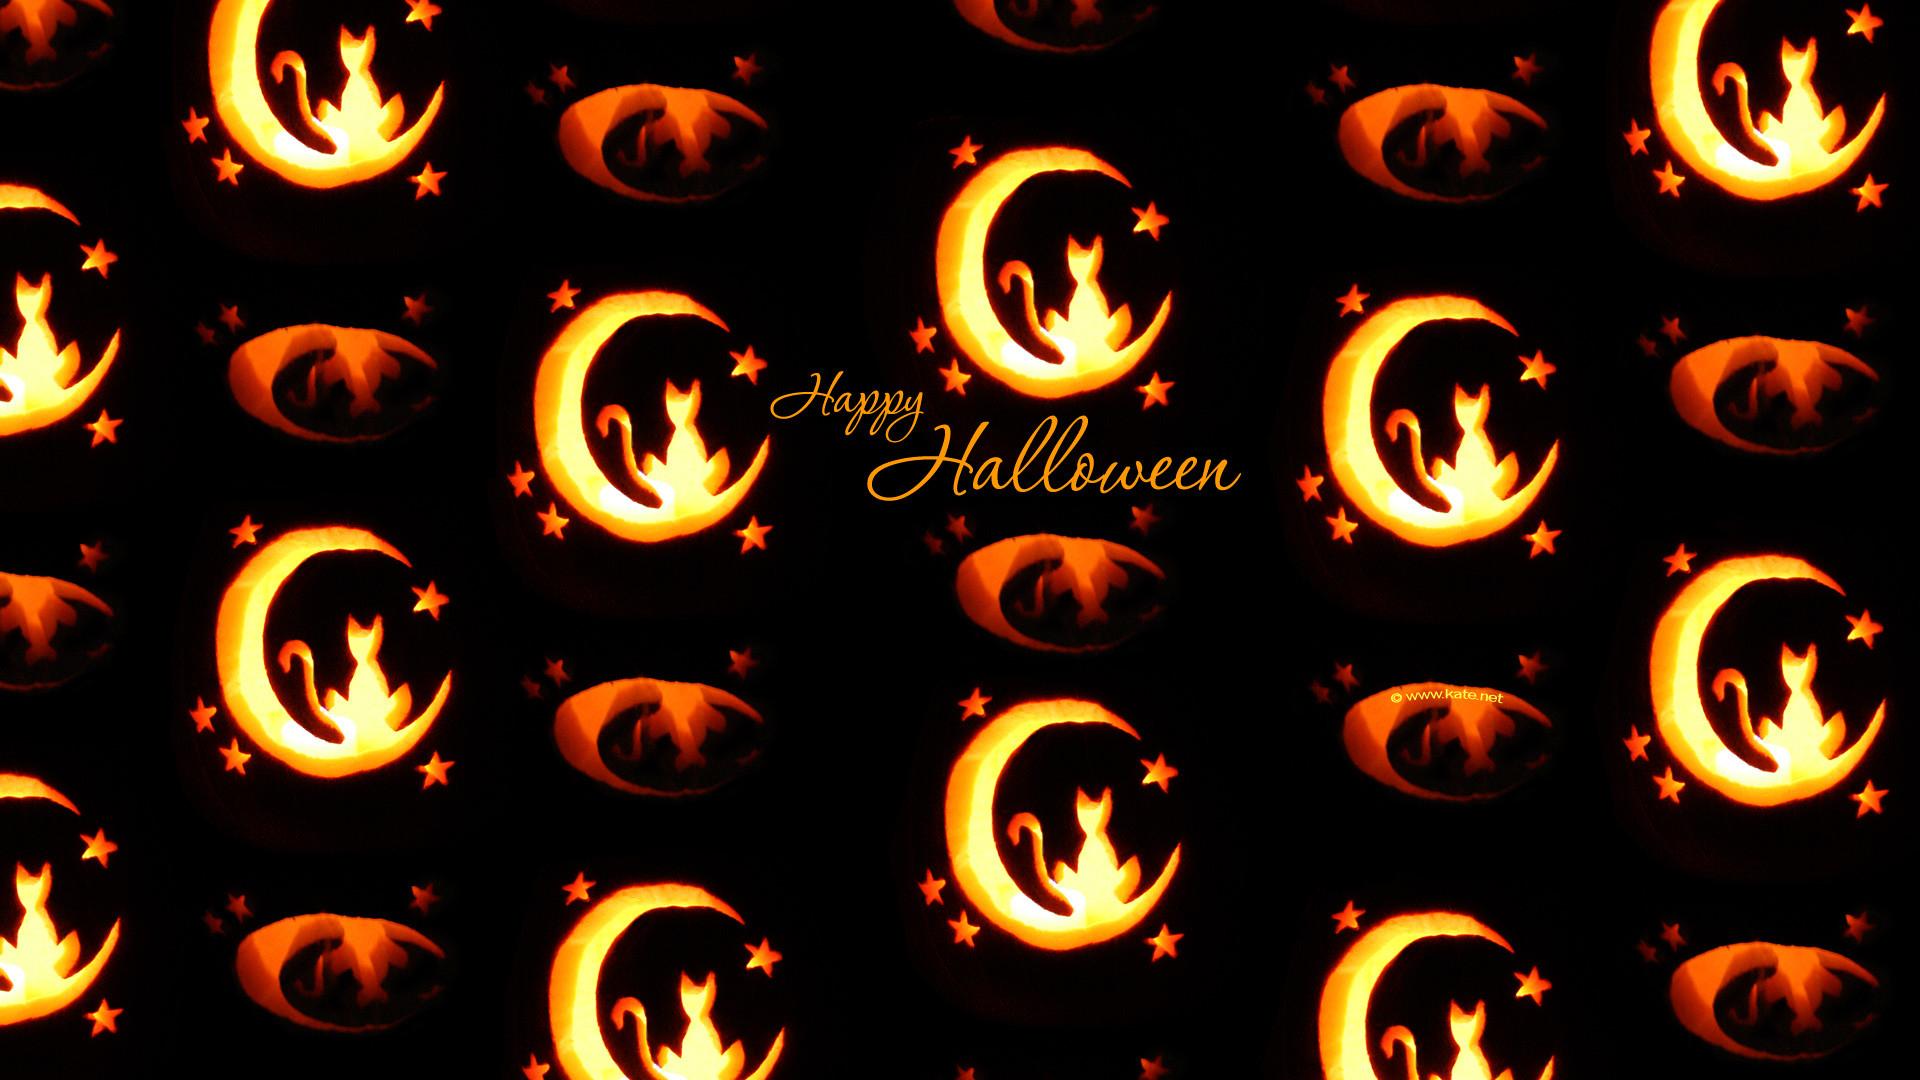 Cute Halloween Wallpaper for Desktop 66 images 1920x1080